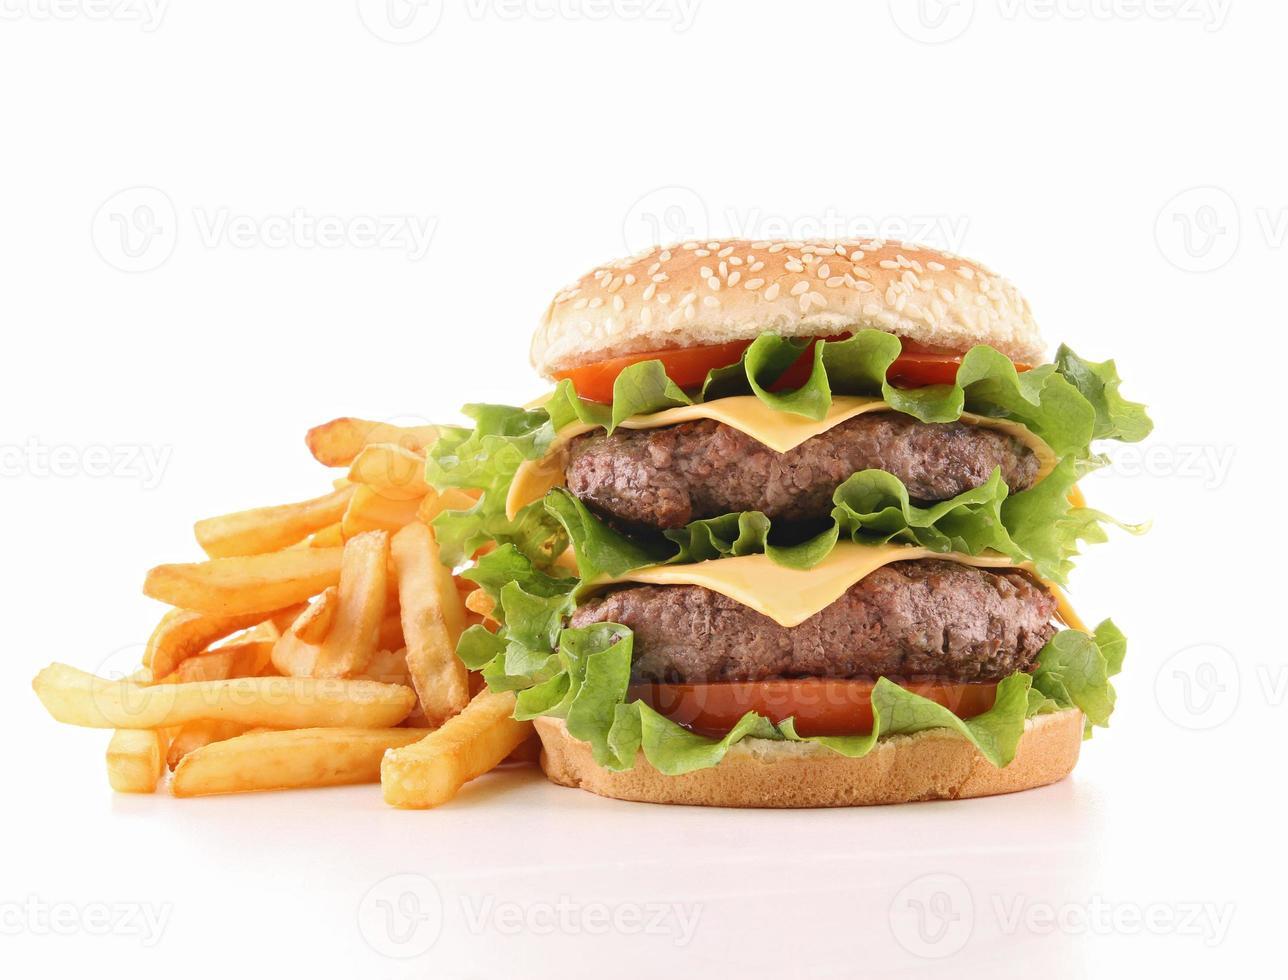 geïsoleerde hamburger en frietjes foto